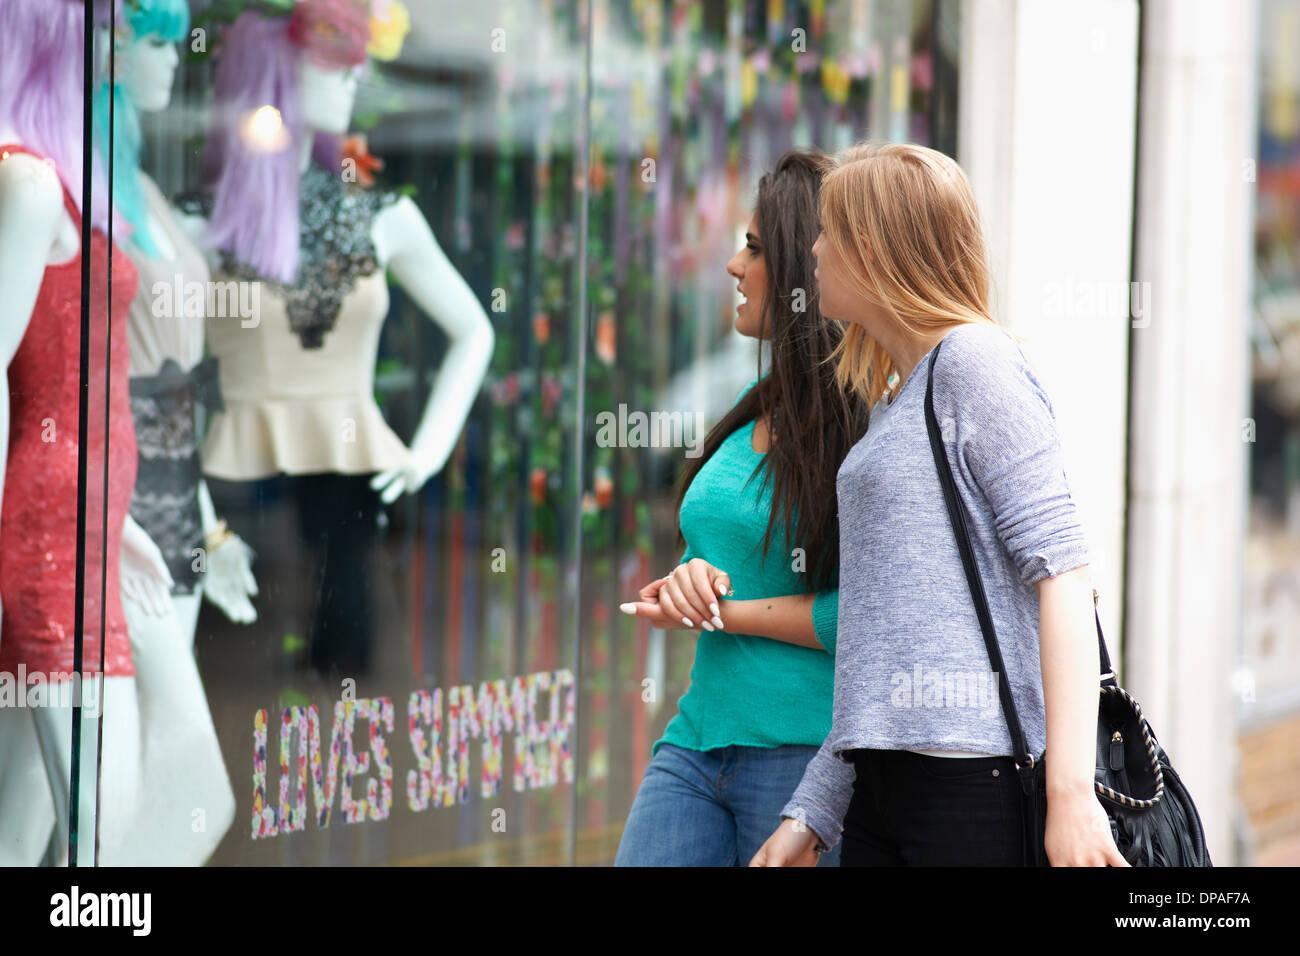 Two teenage girls window shopping - Stock Image